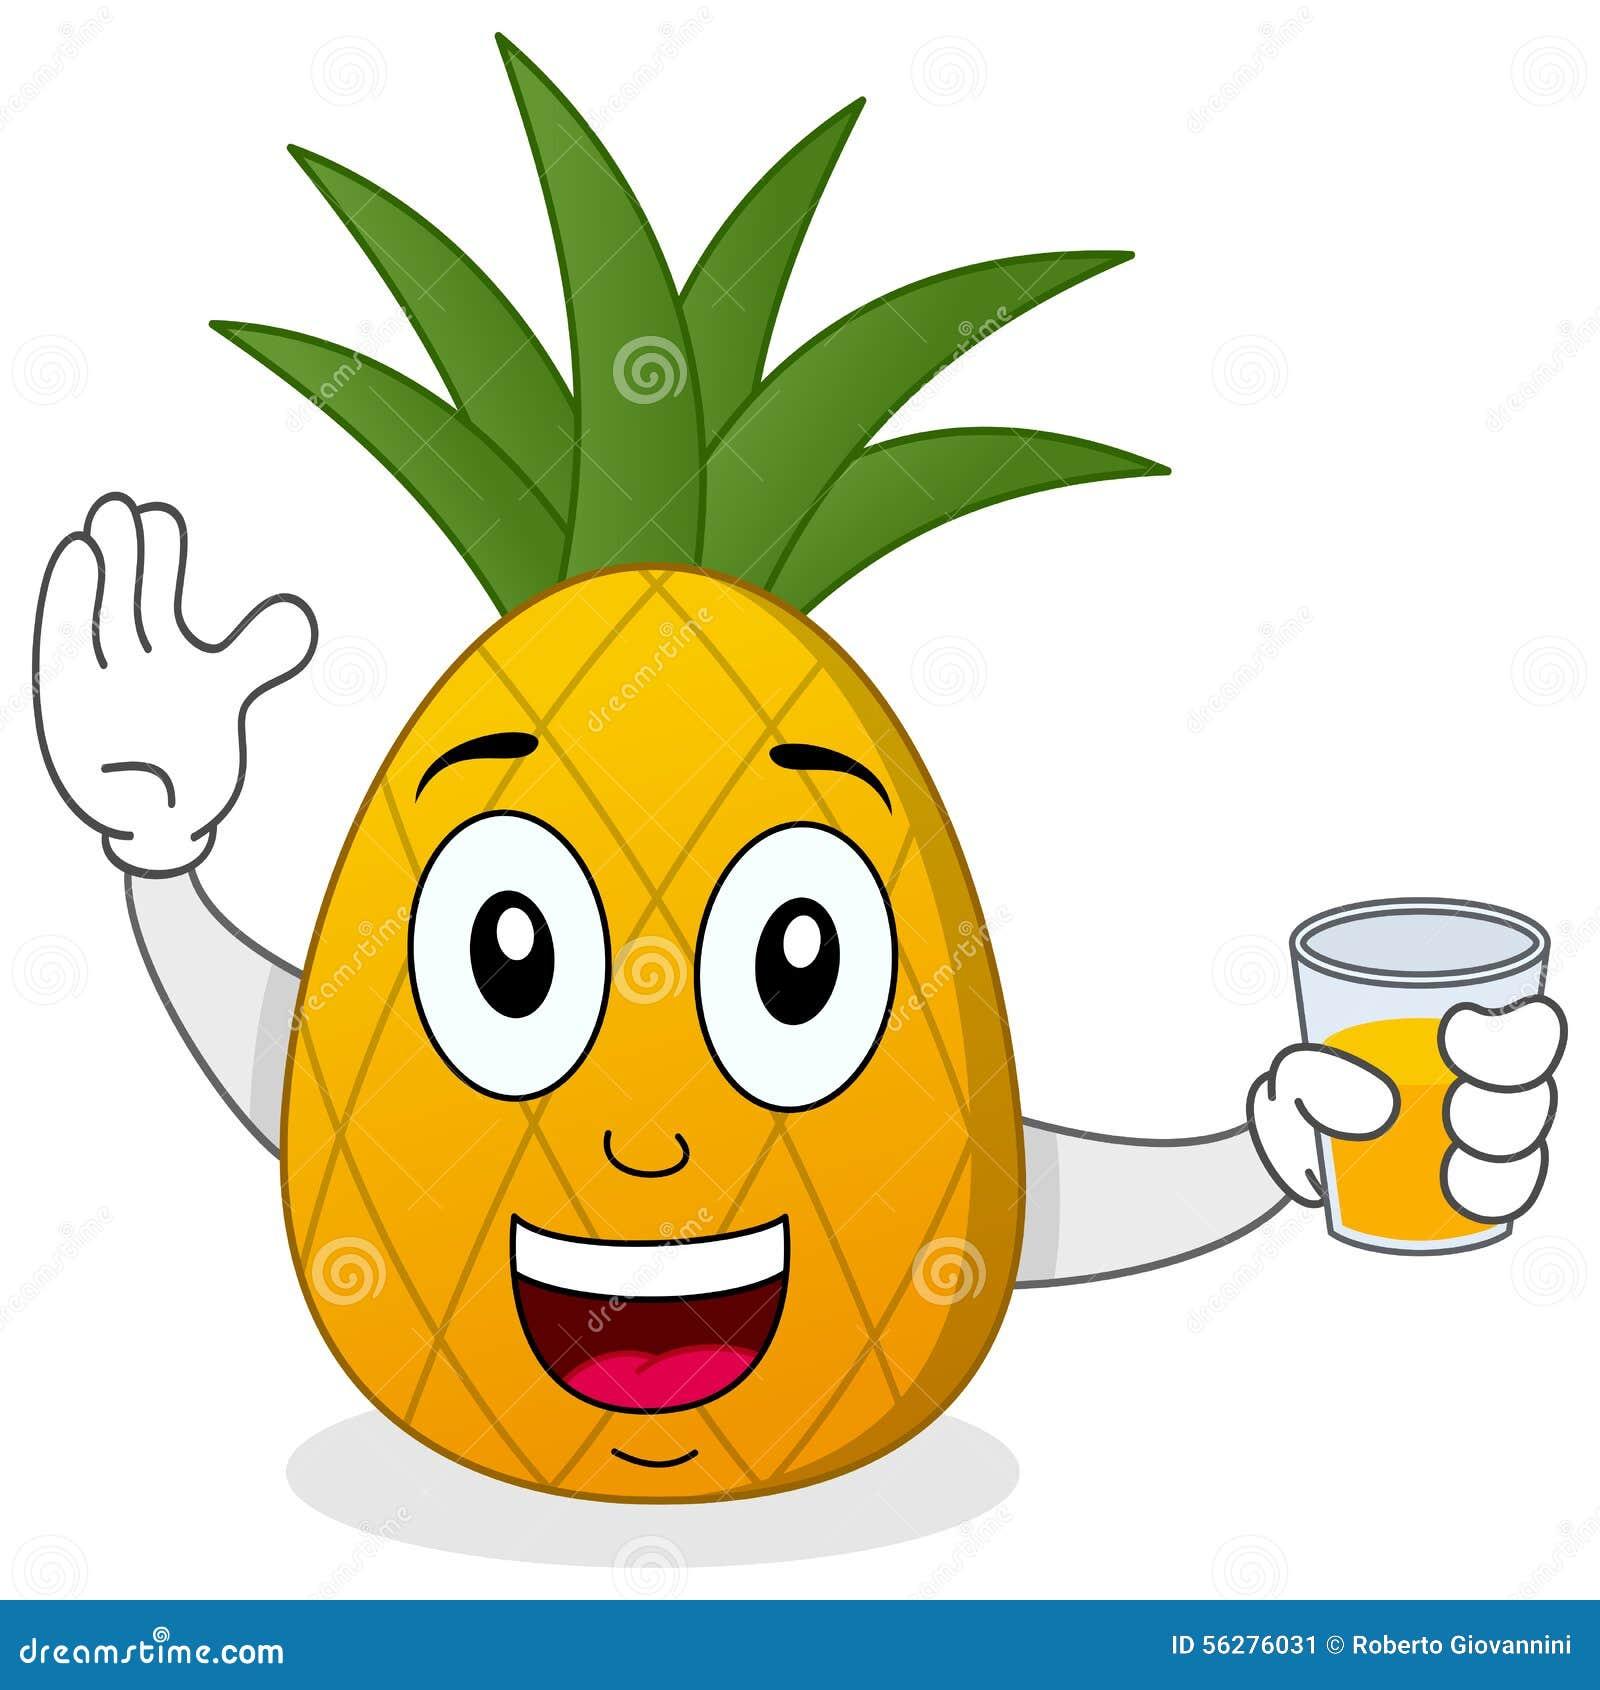 Stock Illustration Strawberry Cartoon Character Vector Illustration Image42332944 together with Orange Juice Box Clip Art 113111 further Orange Fruit Cartoon 10274553 besides Orange Graphics also Mango character. on orange juice cartoon character